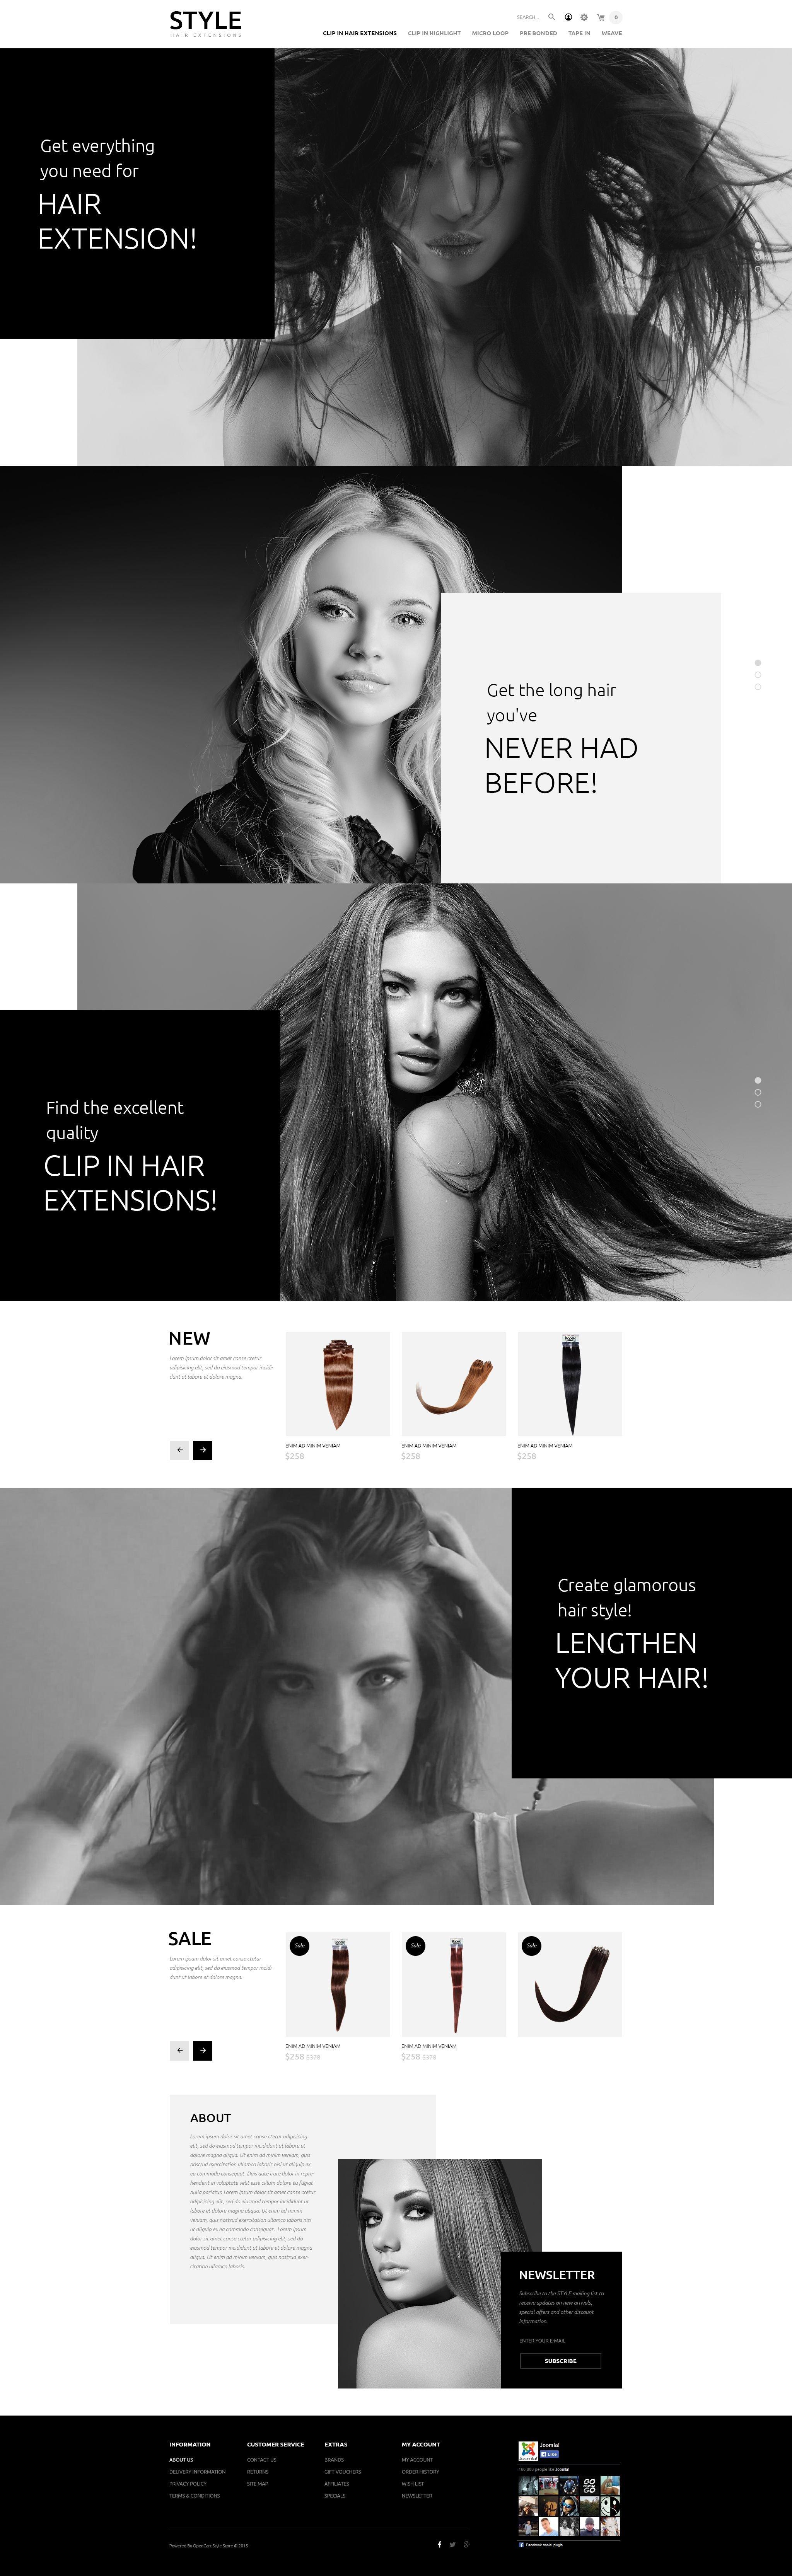 Responsywny szablon OpenCart Hair and Beauty Salon #54746